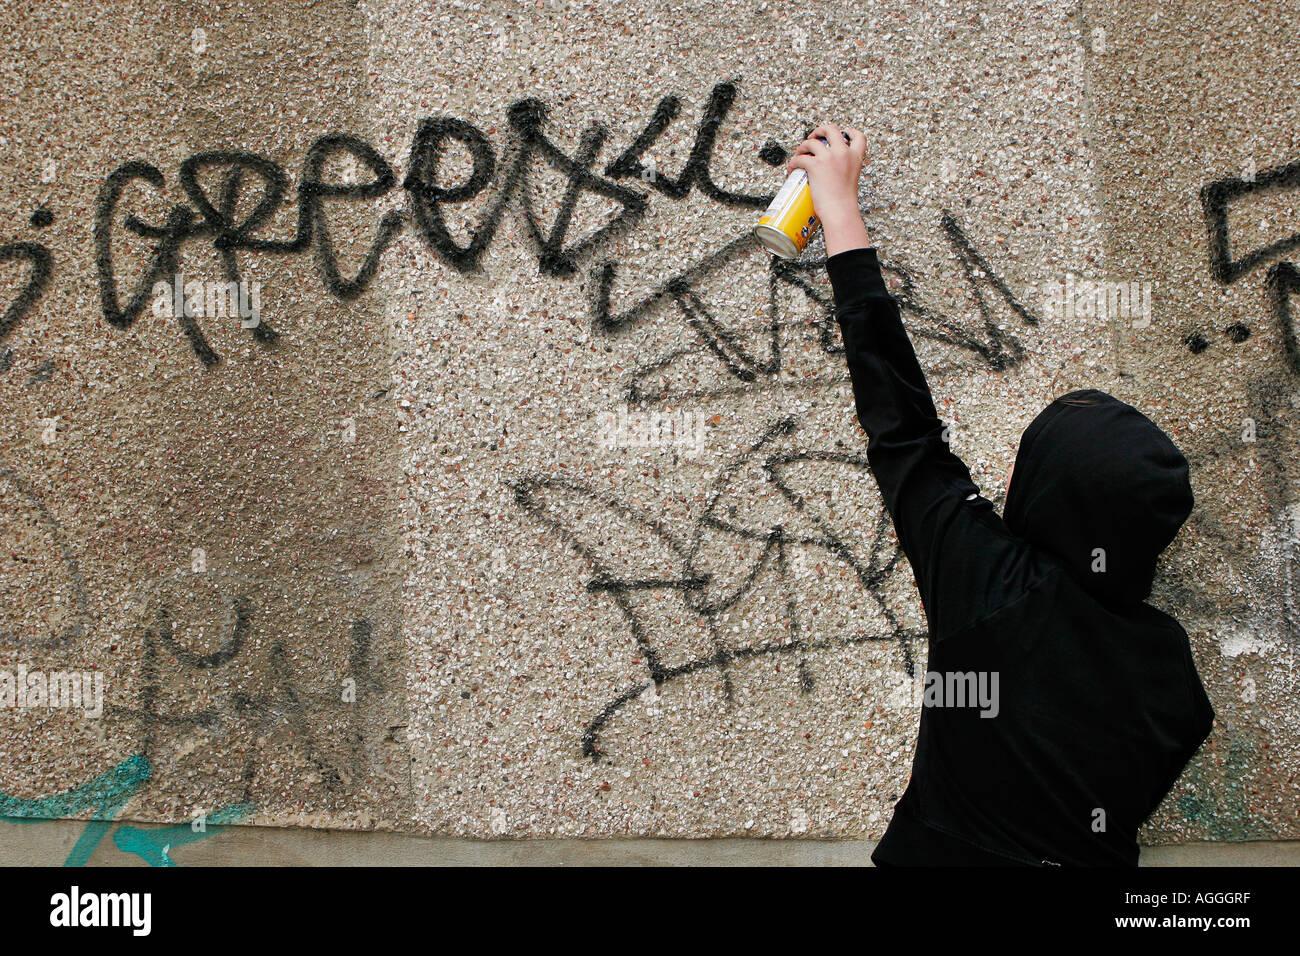 Teenagers spraying graffitti - Stock Image